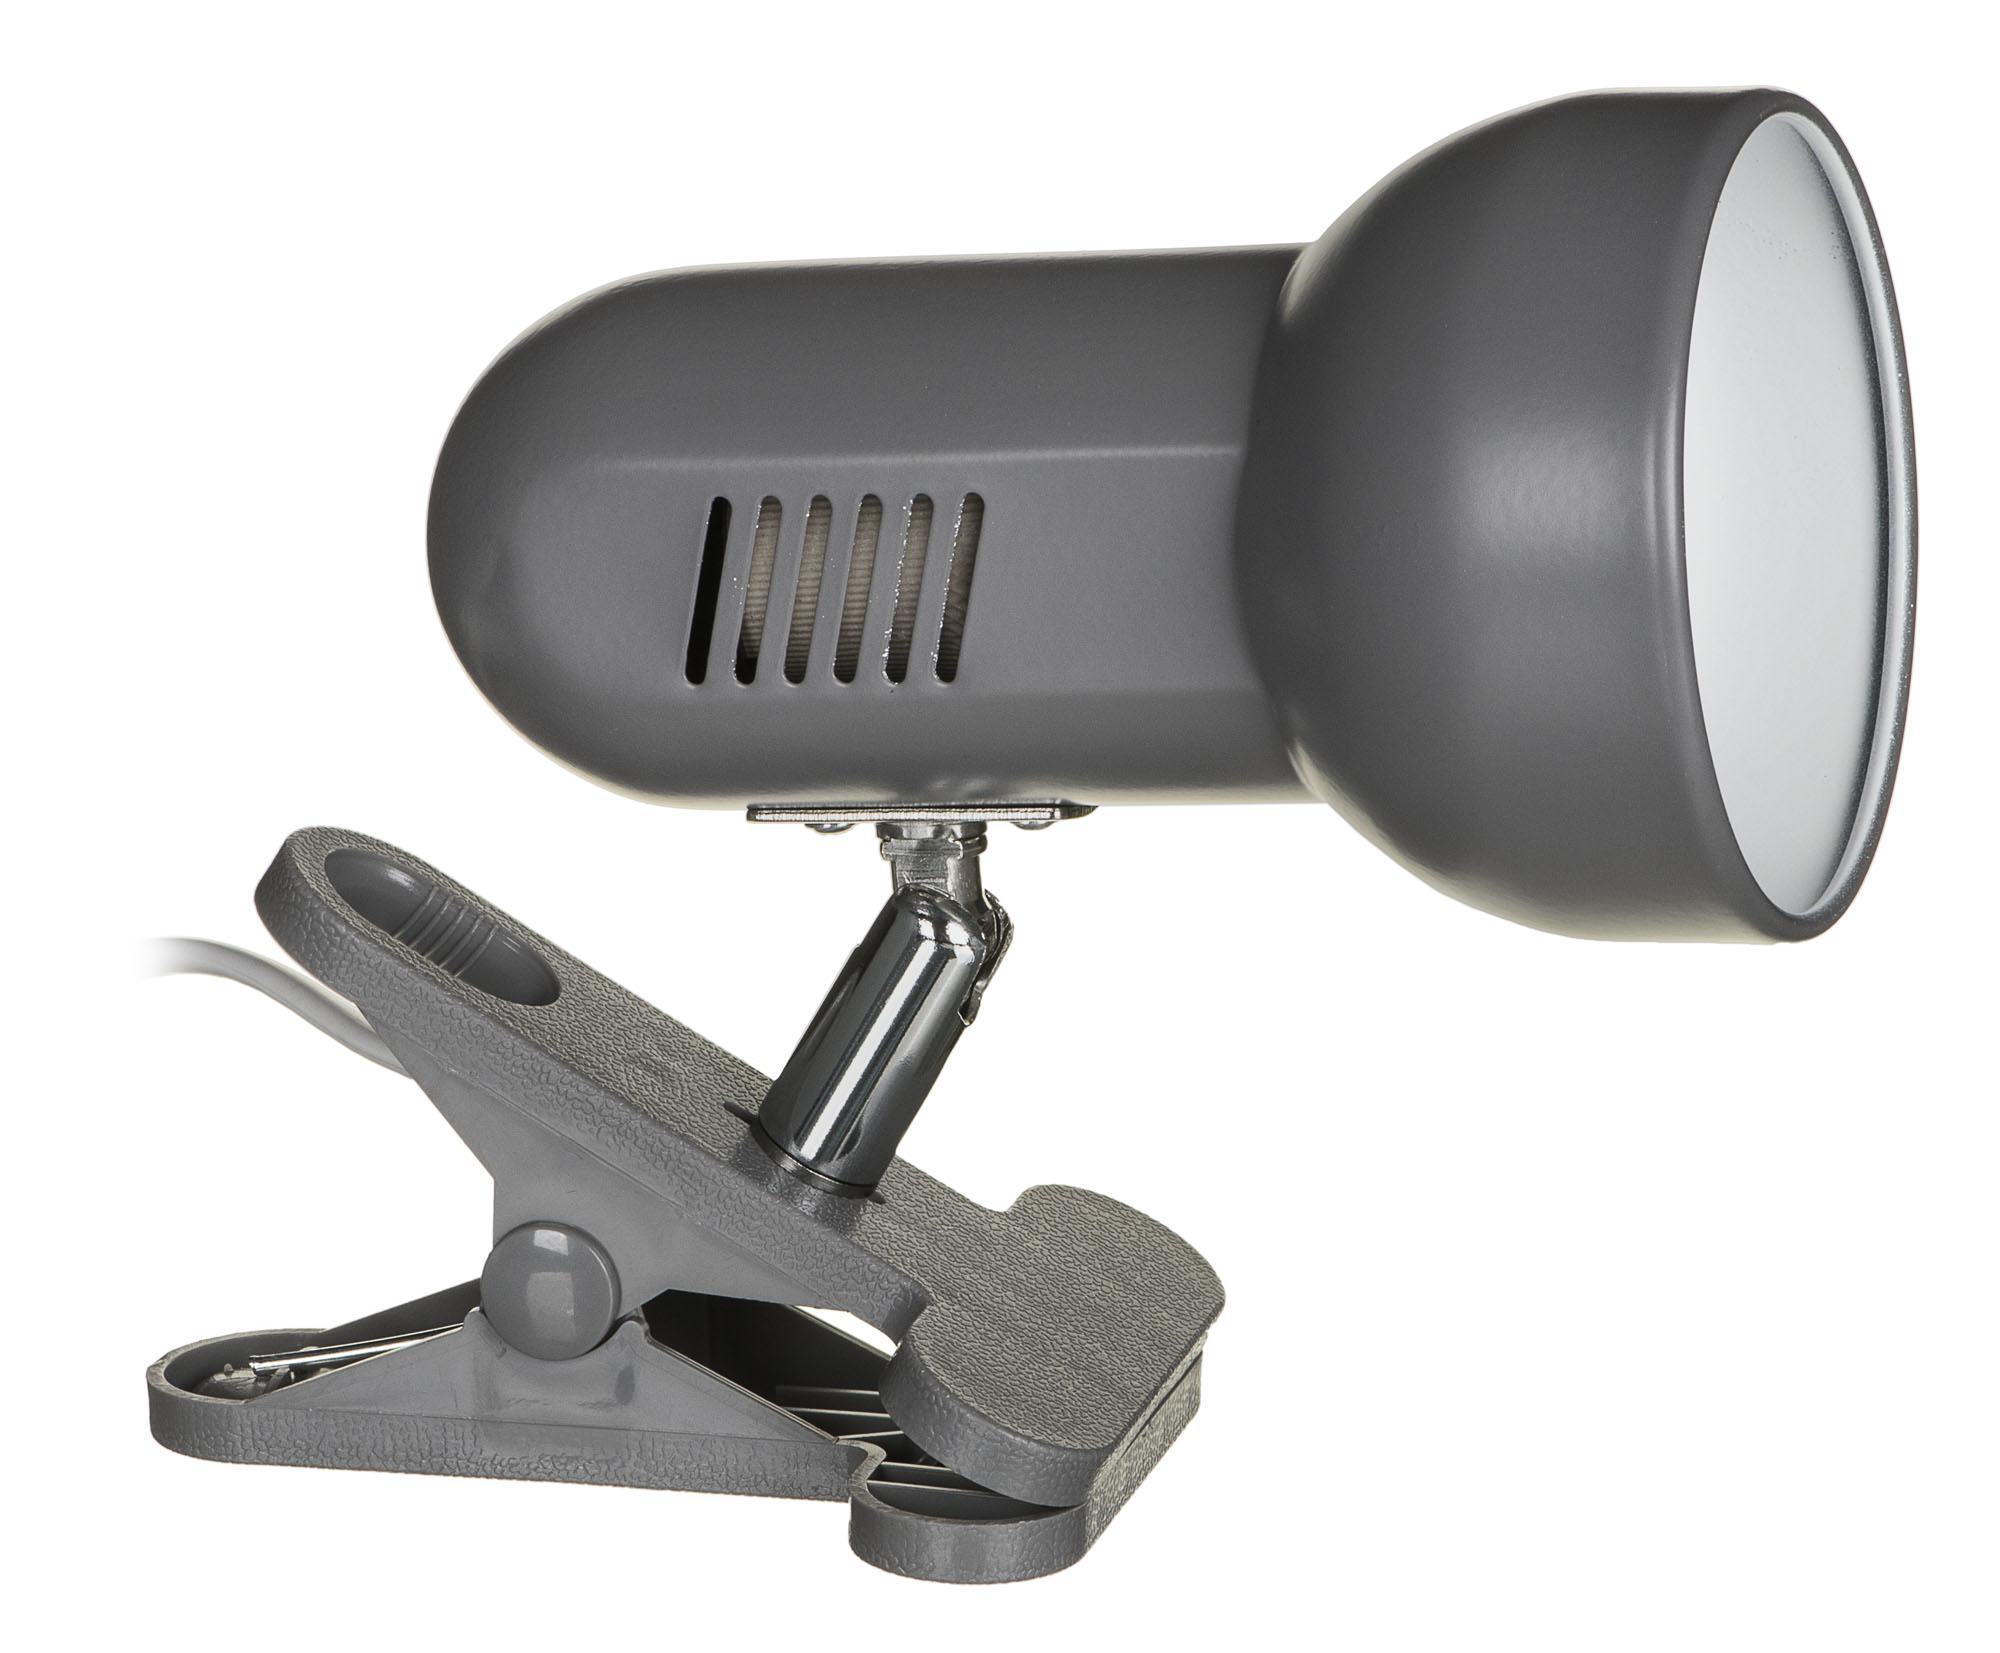 Lampka na klips szara AJE-CLIP LAMP GREY E27